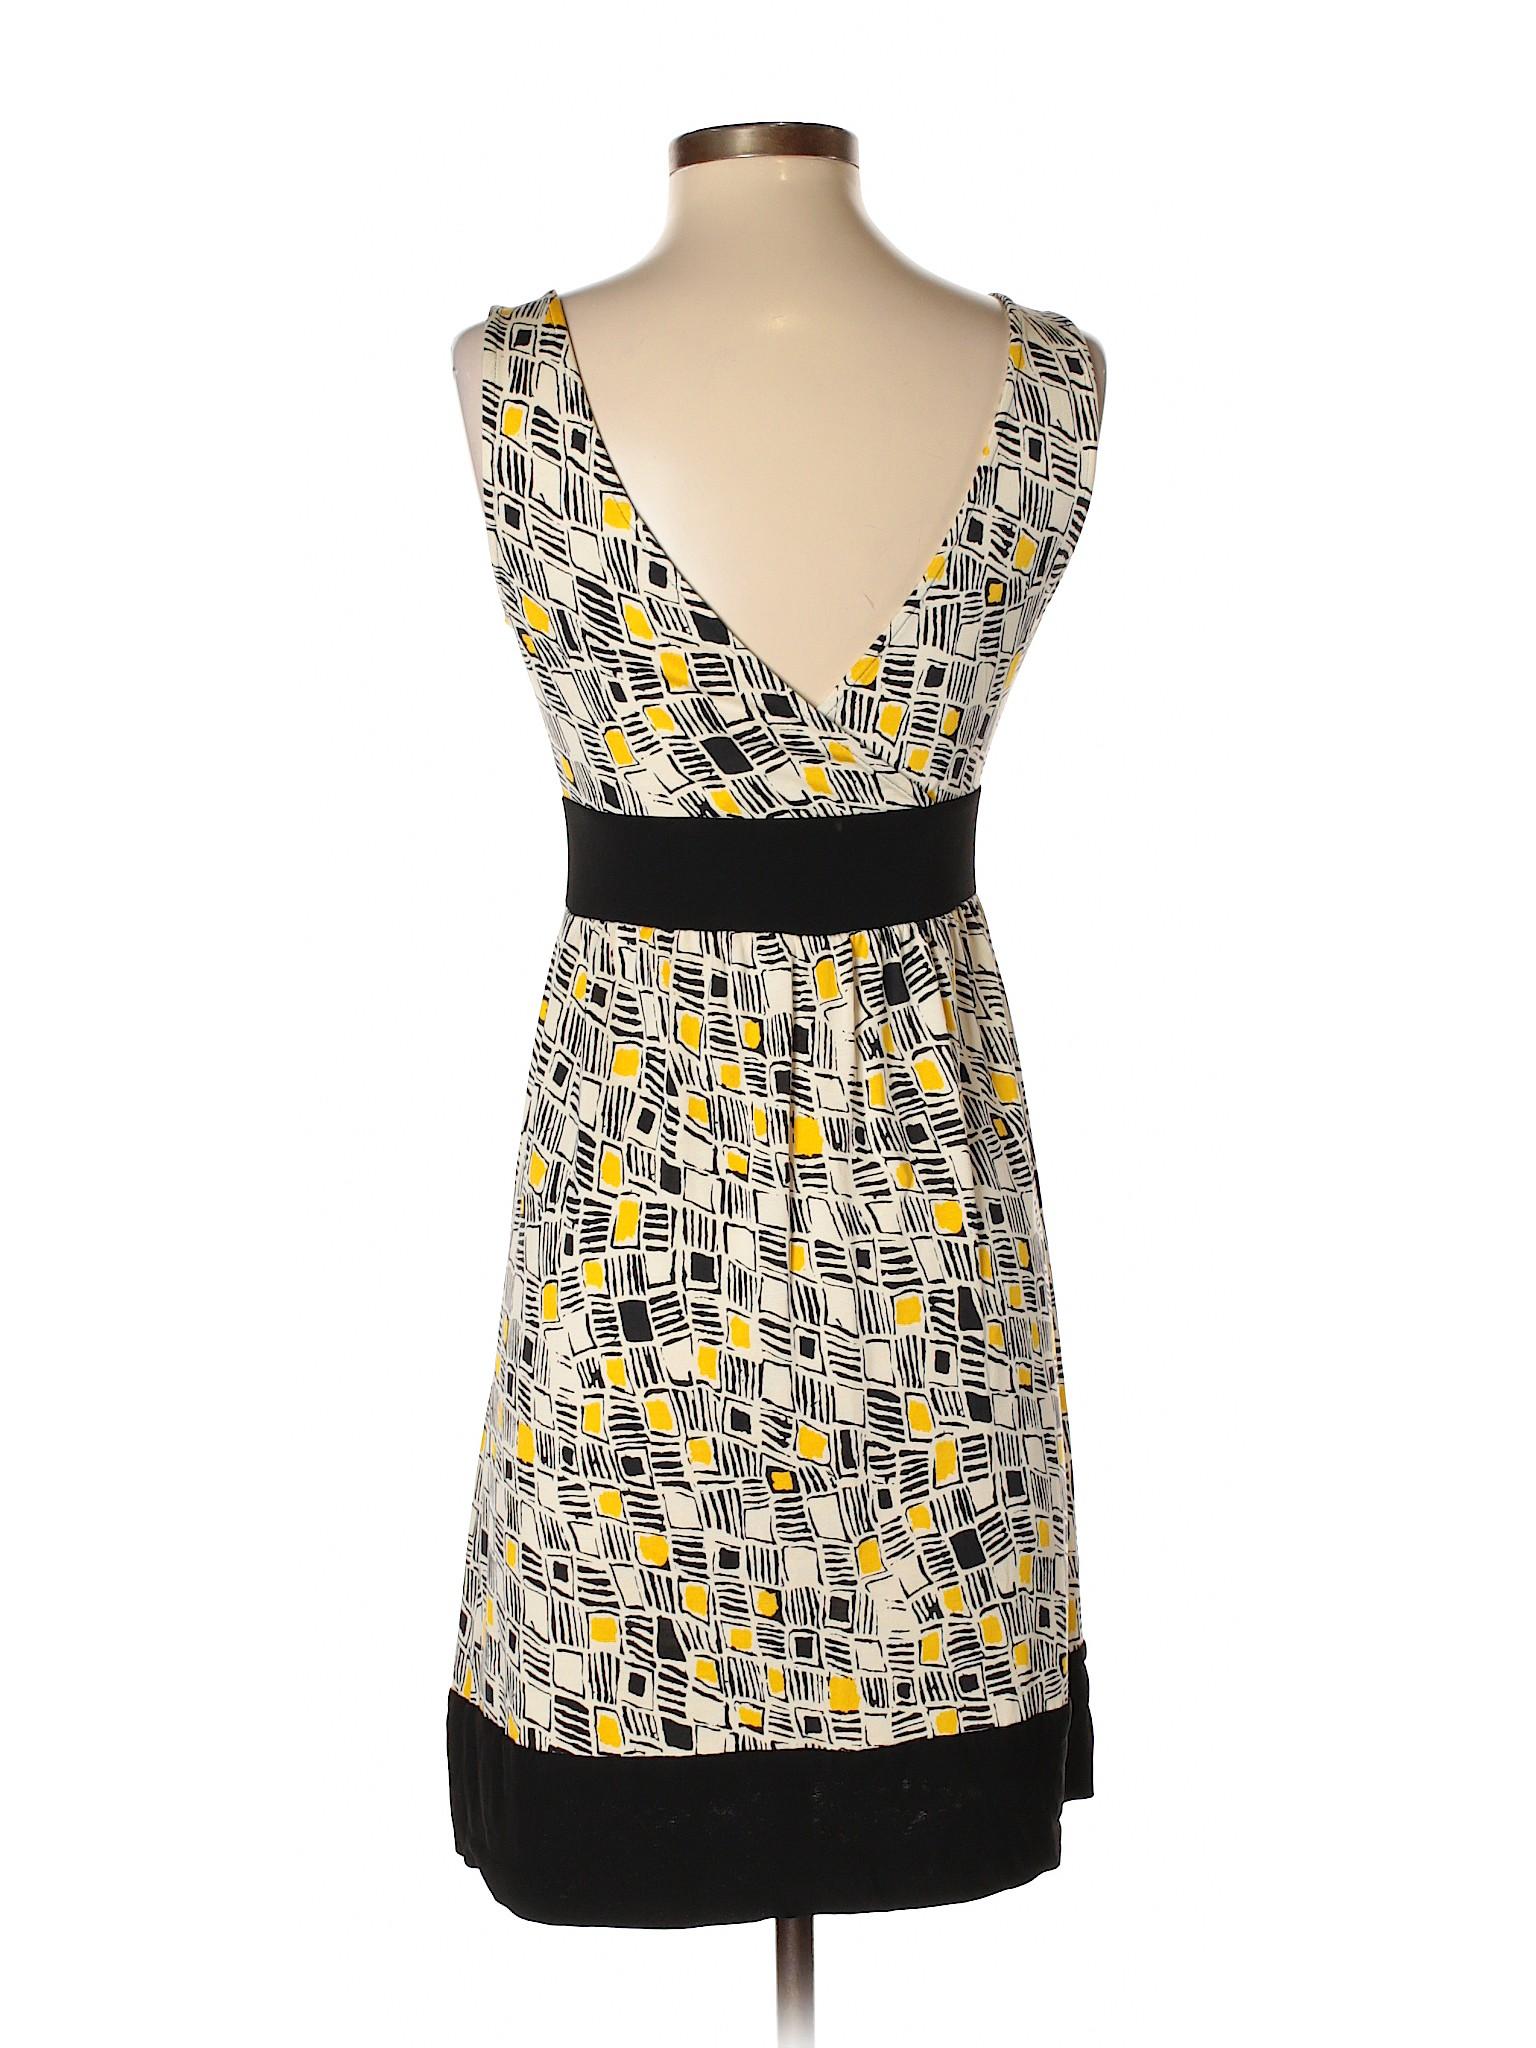 von Furstenberg Selling Dress Diane Casual A5YqT